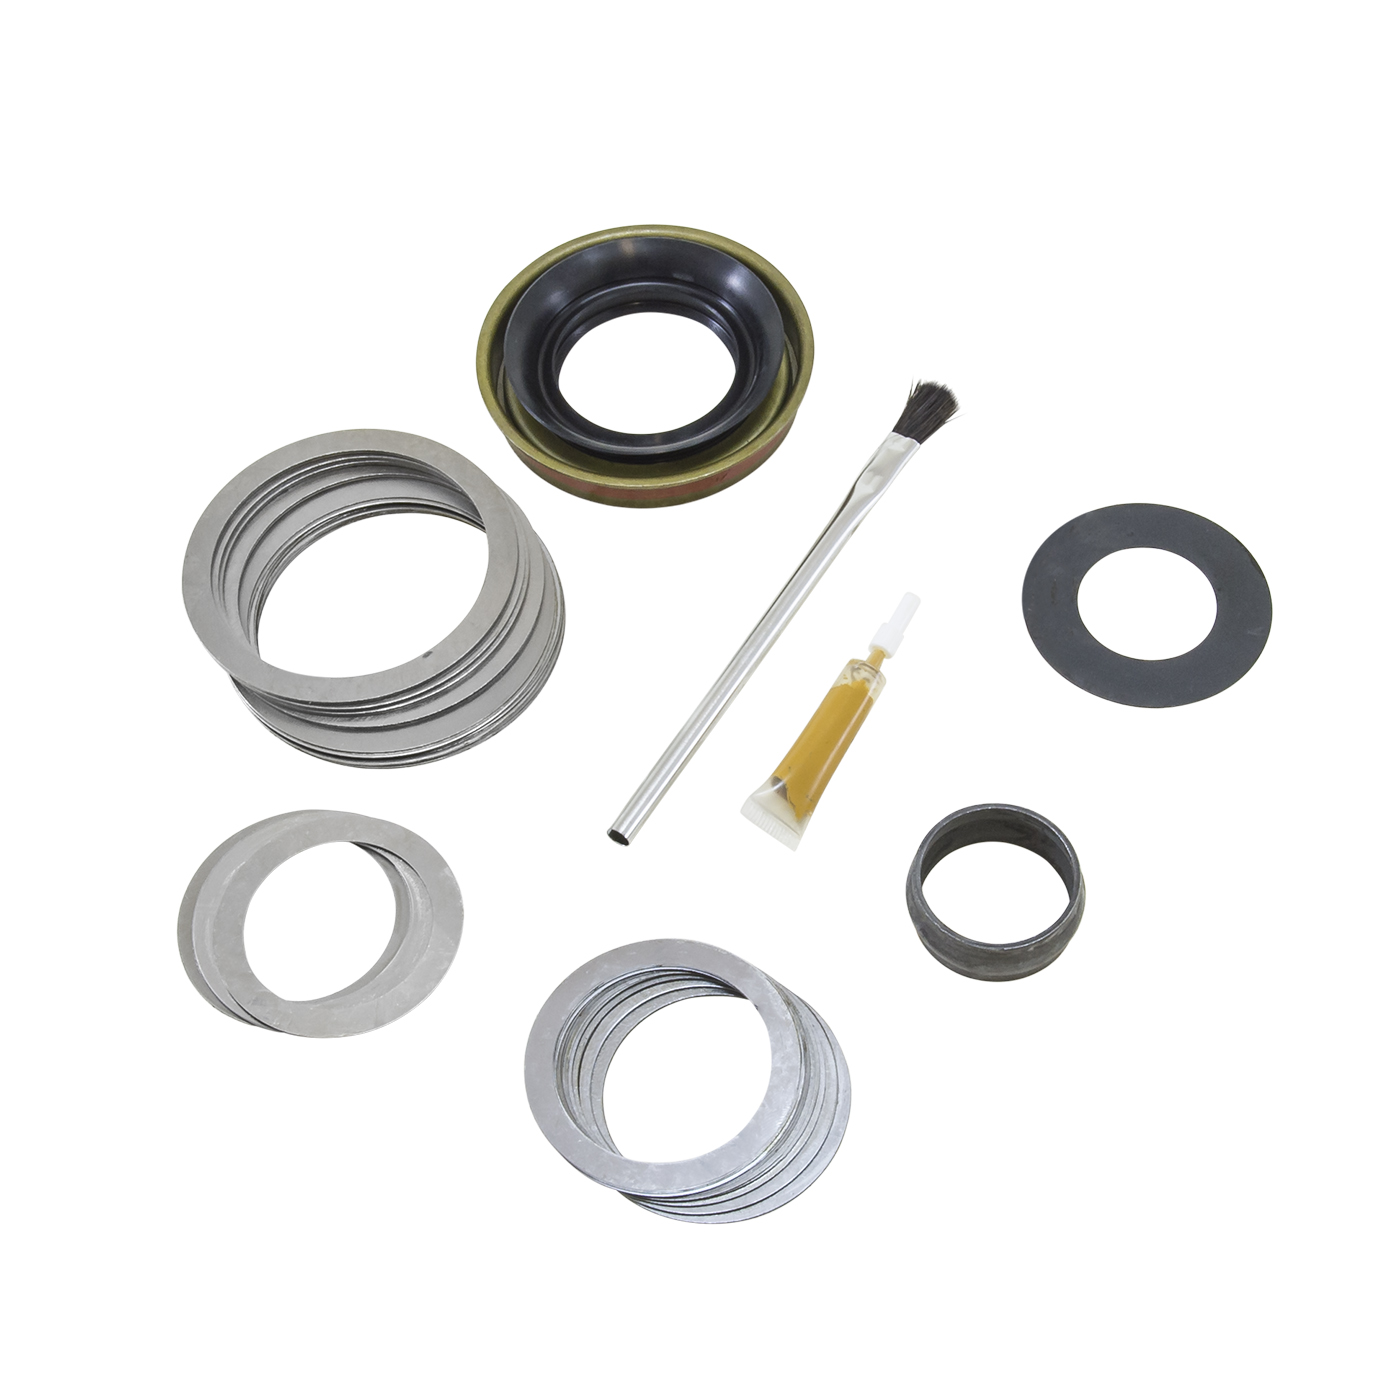 Minor Installation Kit for GM 8.6 Rear Differential MK GM8.6 Yukon Gear /& Axle